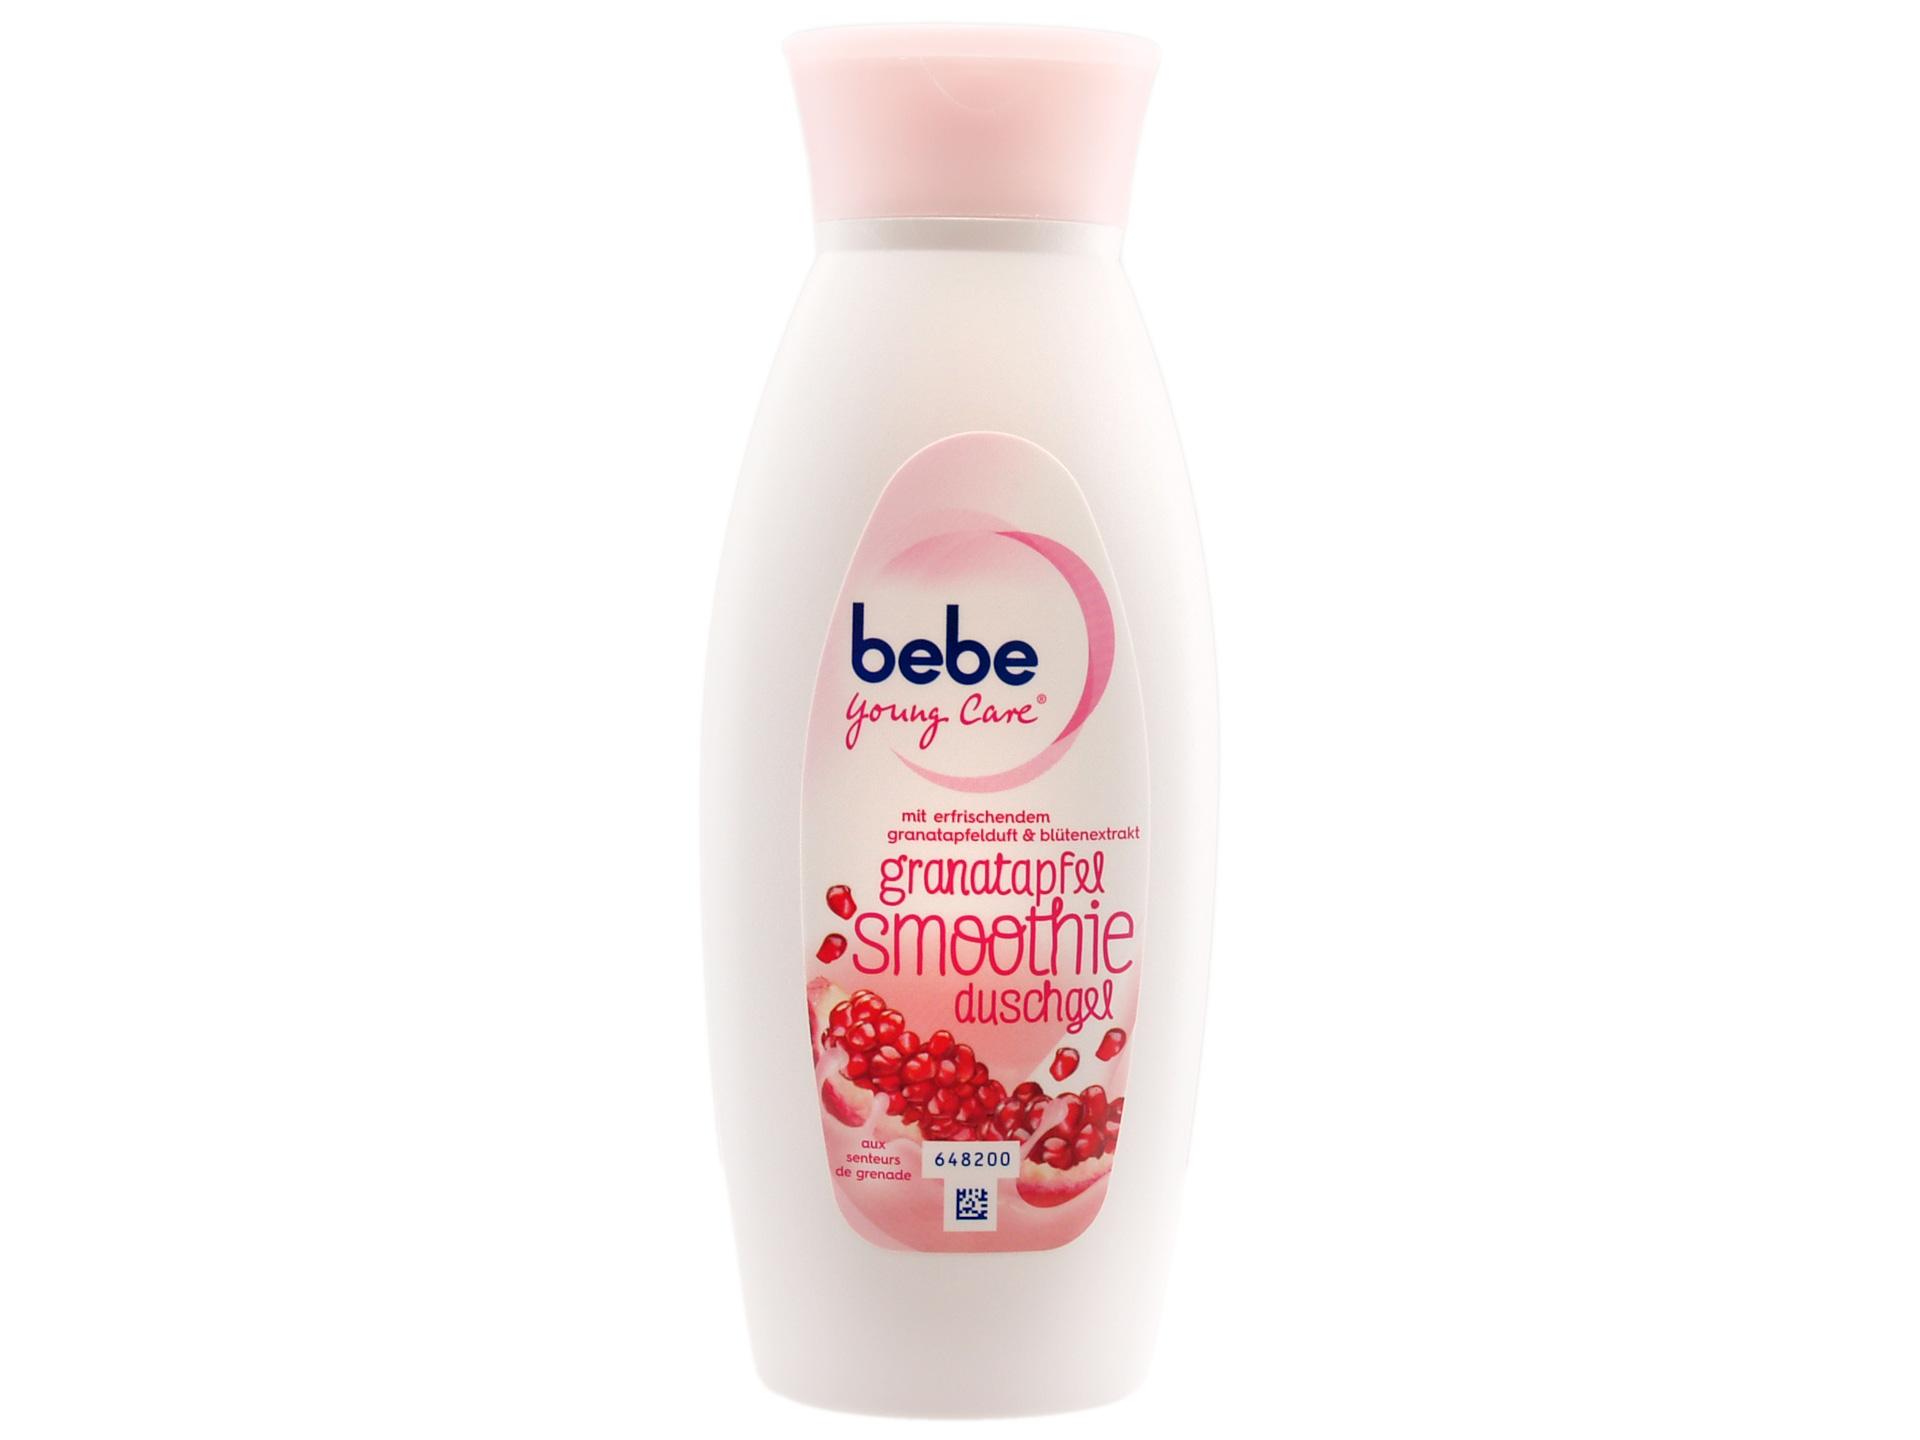 Top Bebe Young Care Granatapfel Smoothie Duschgel (250ml) | Specials @PY_23